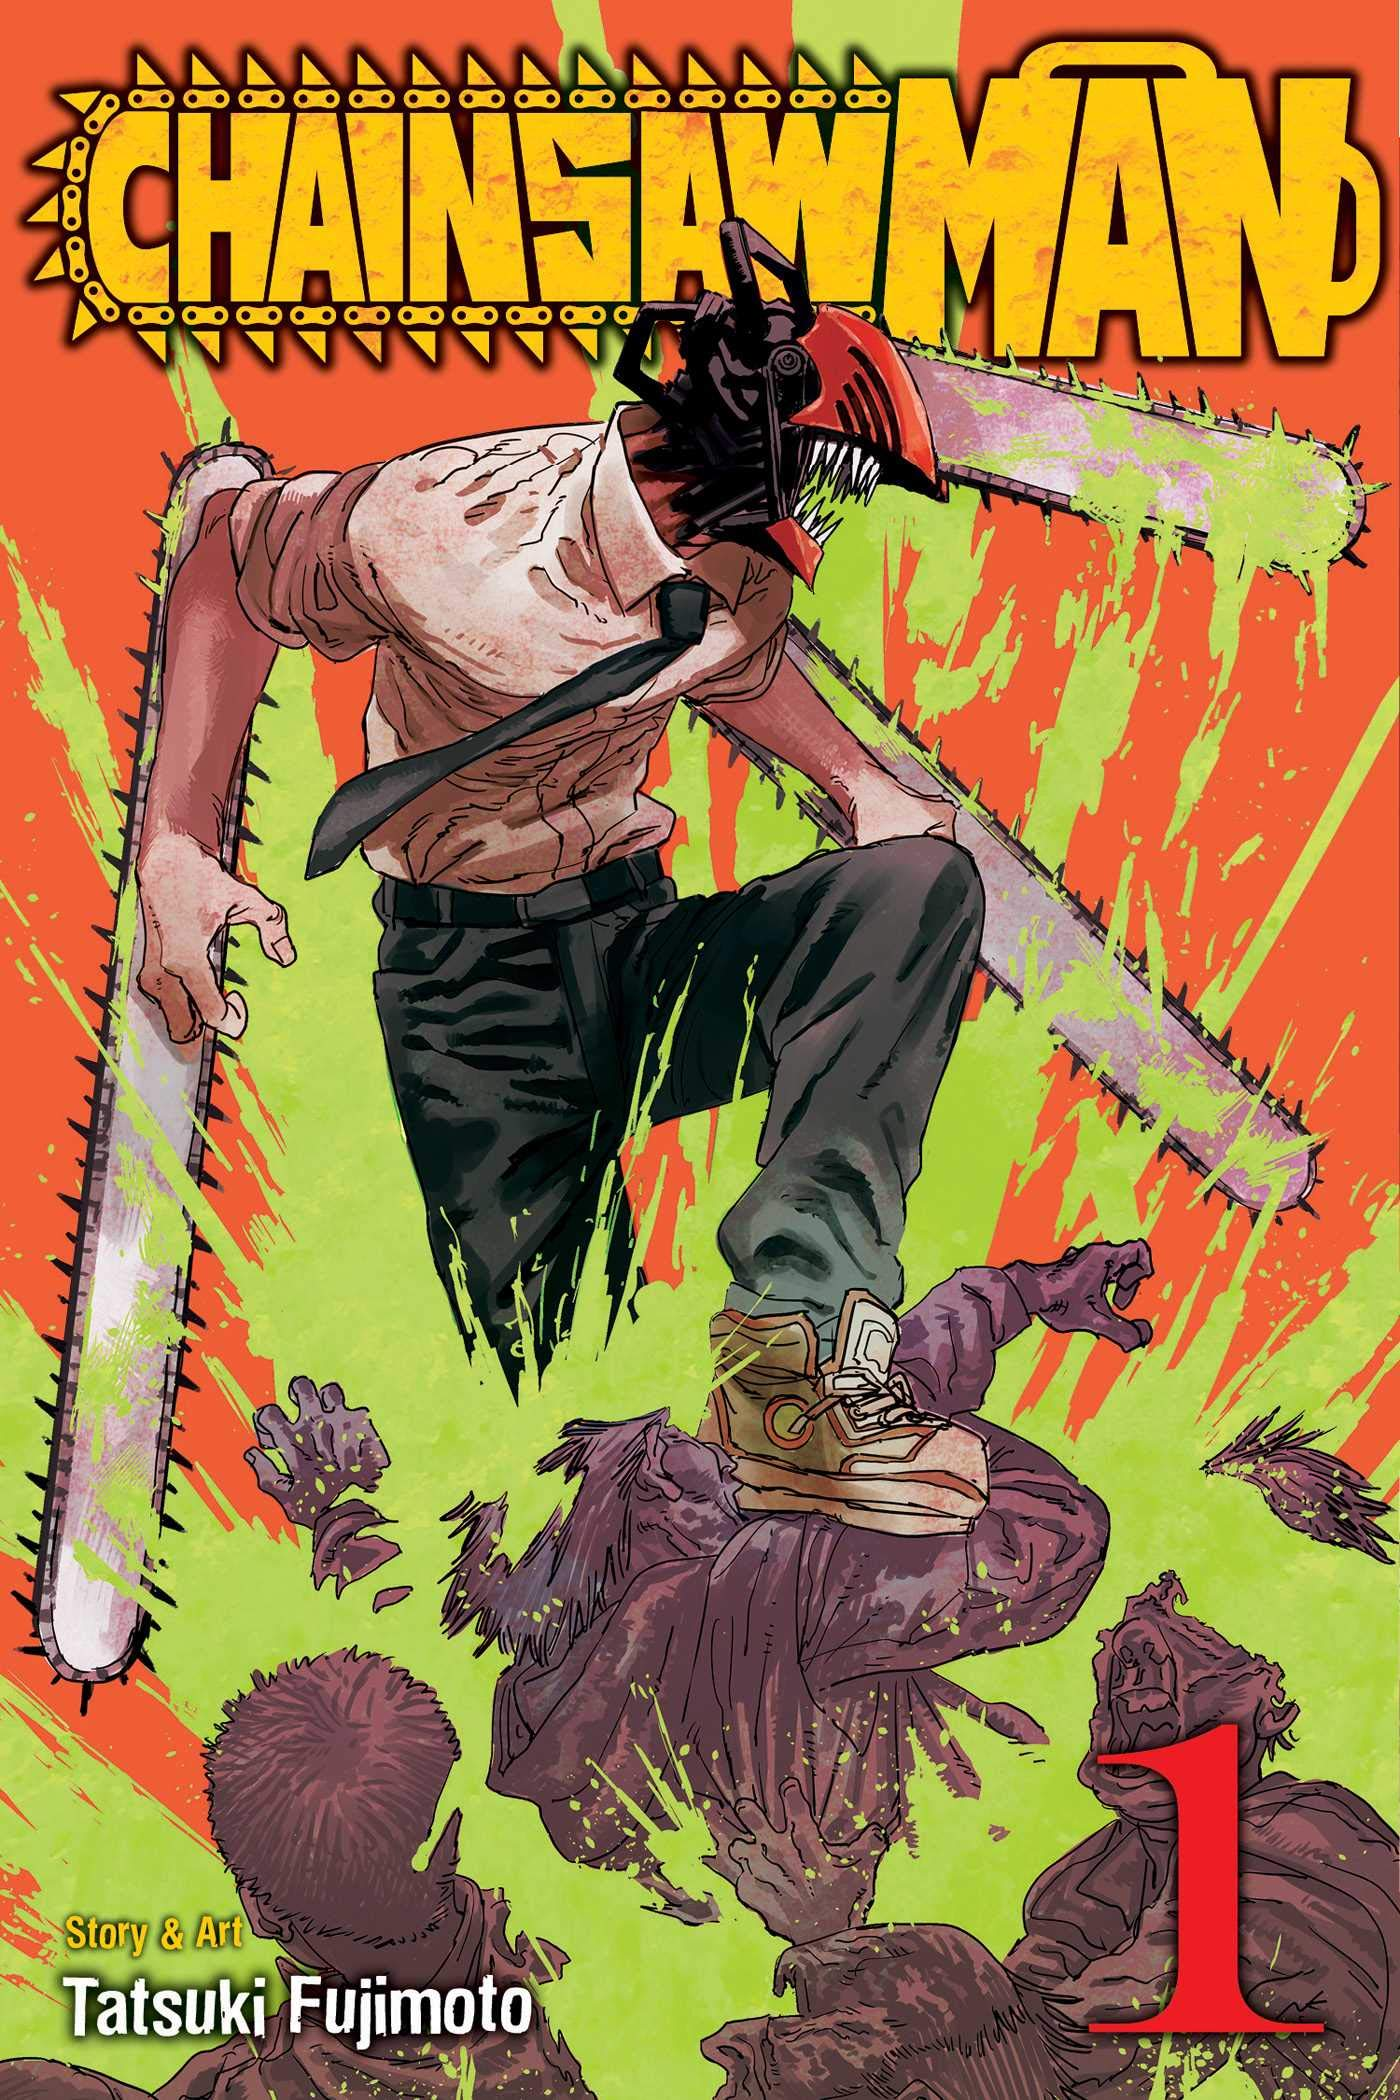 Chainsaw Man, Vol. 1 (1): Fujimoto, Tatsuki: 9781974709939: Amazon.com:  Books